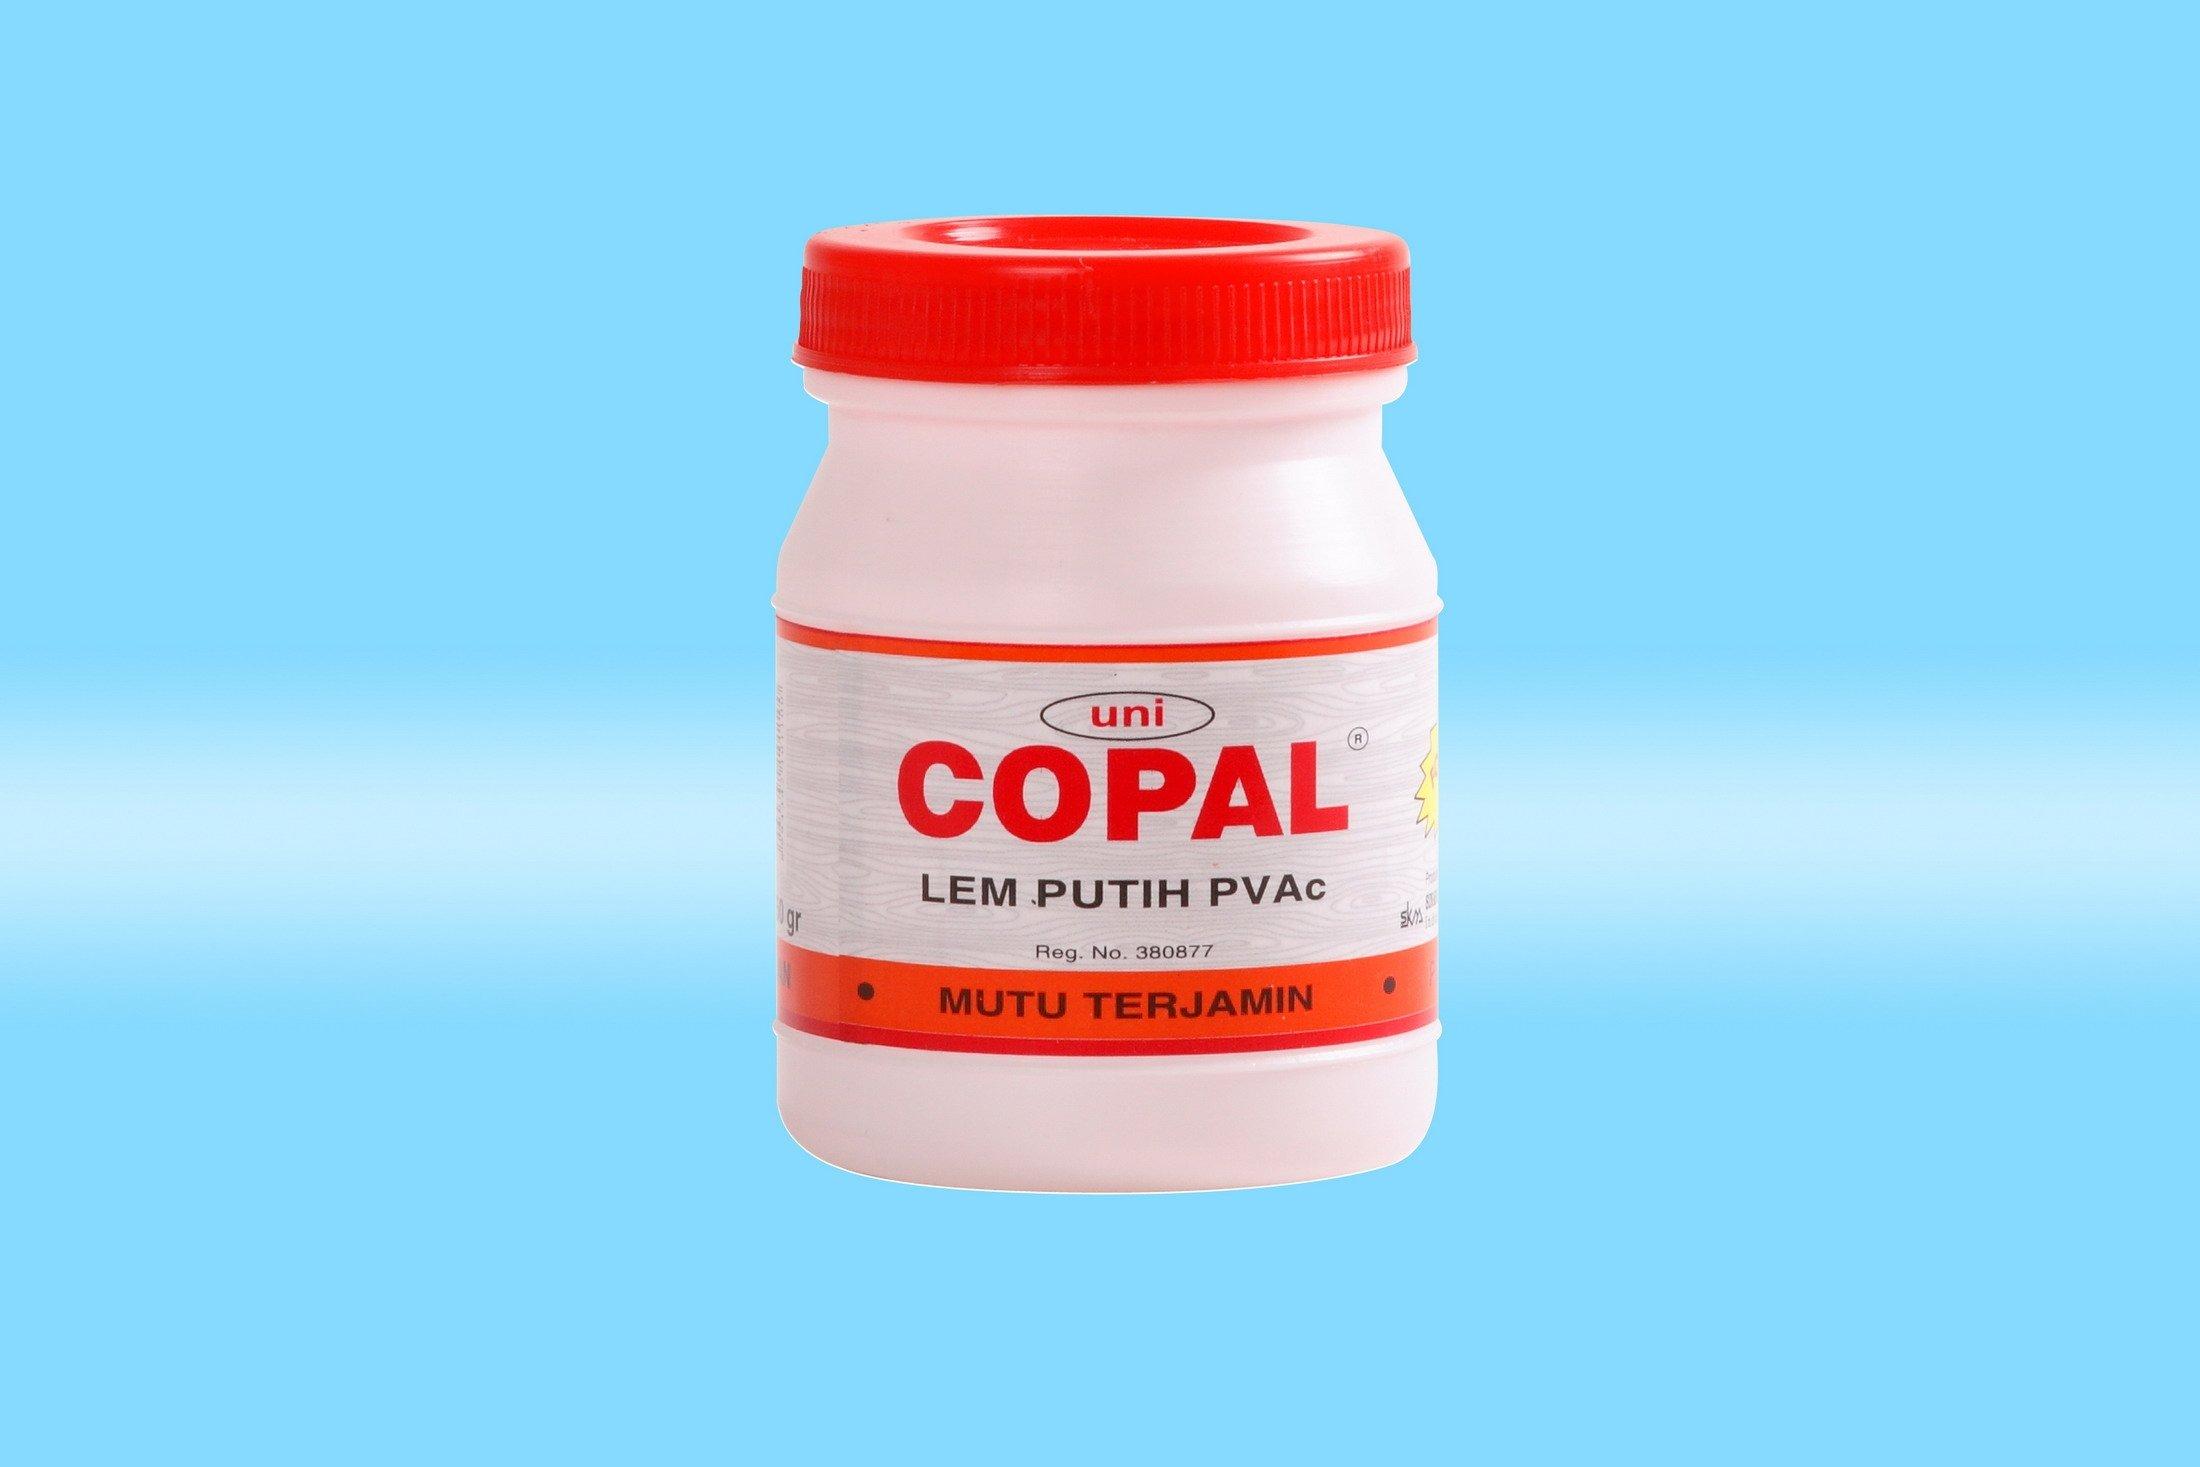 White Copal Photoimages Pictures On Alibaba Lem Kertas Stick Glue 15 Gram